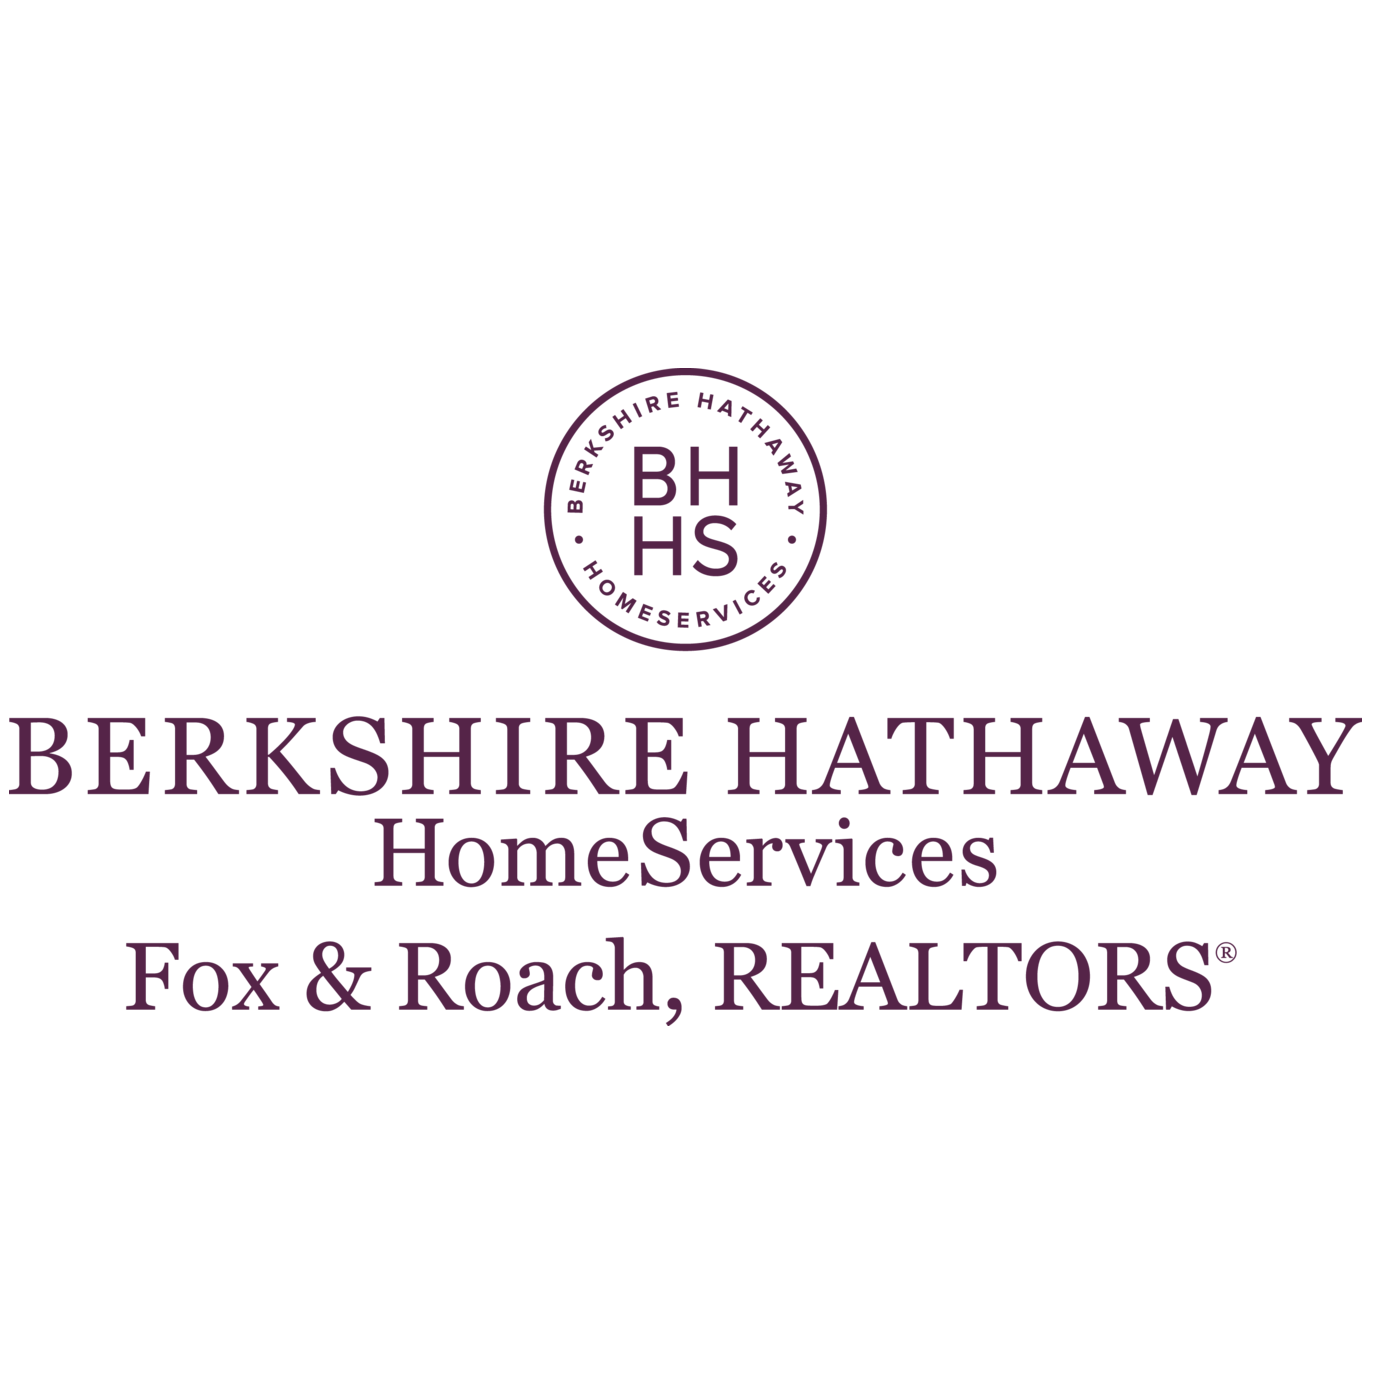 Marji Pendergast & Rachel Kurtyka - BHHS Fox & Roach Realtors